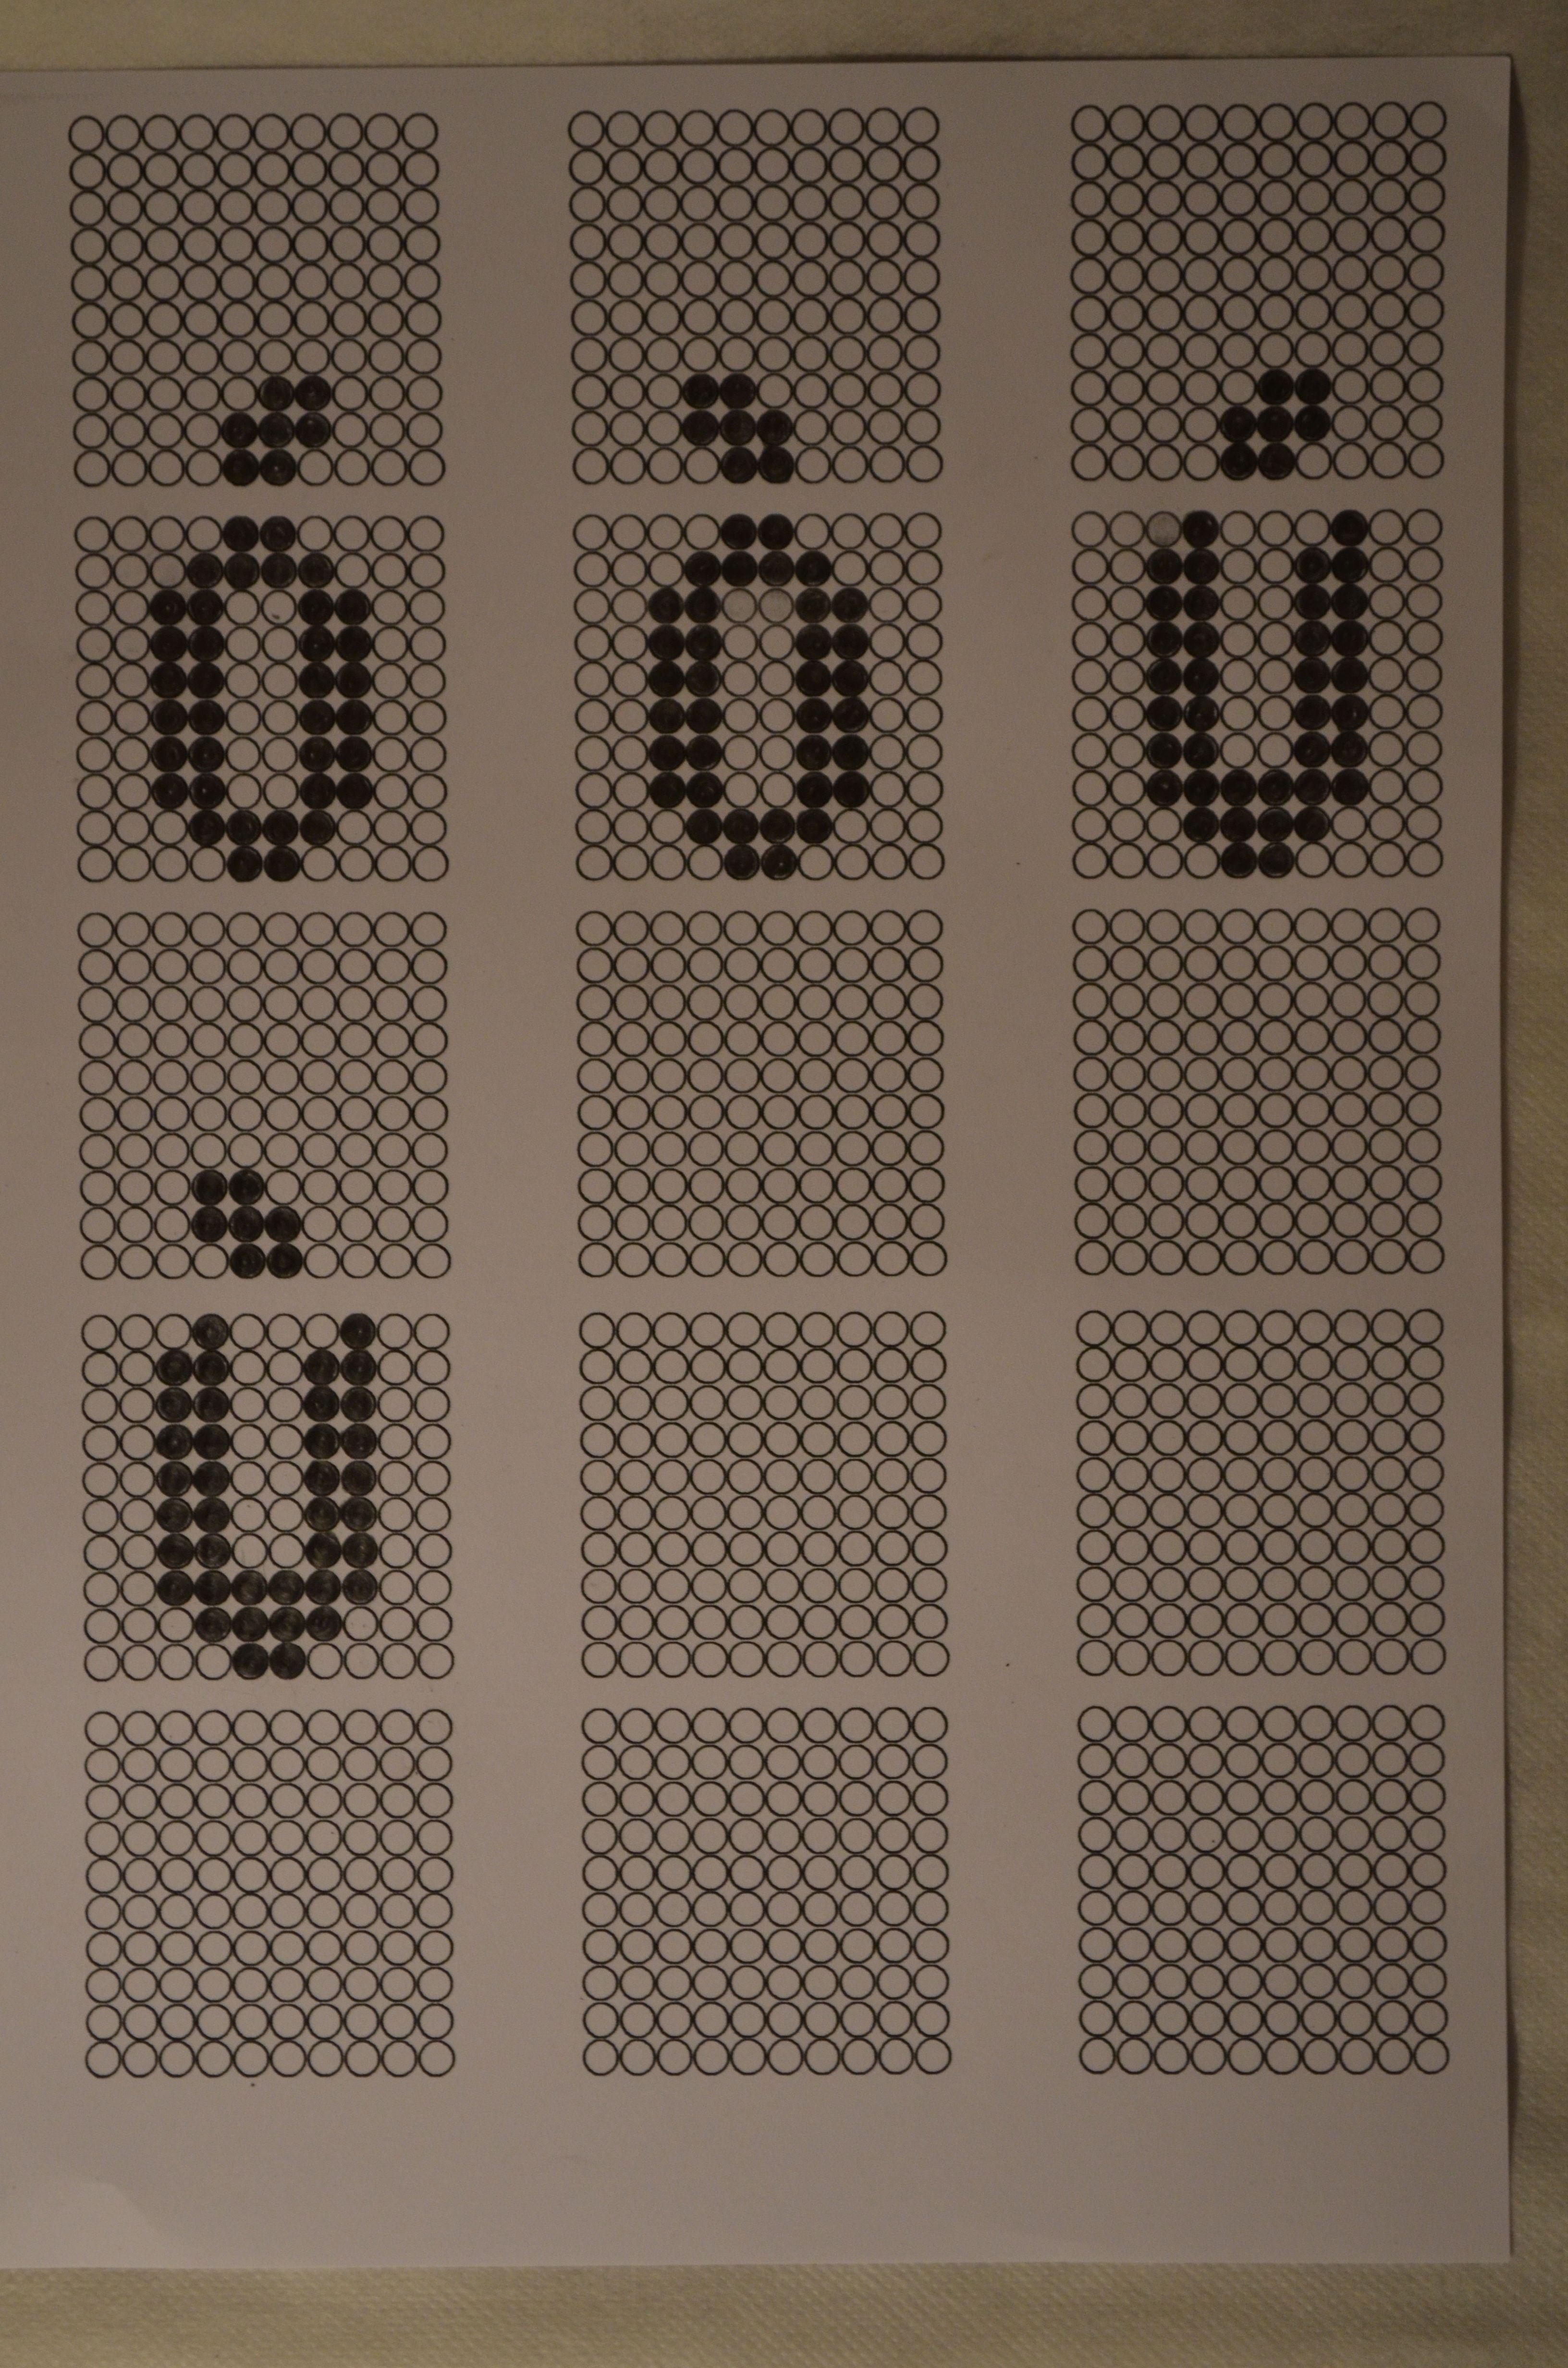 Lettere ' Ò Ó Ù Ú '